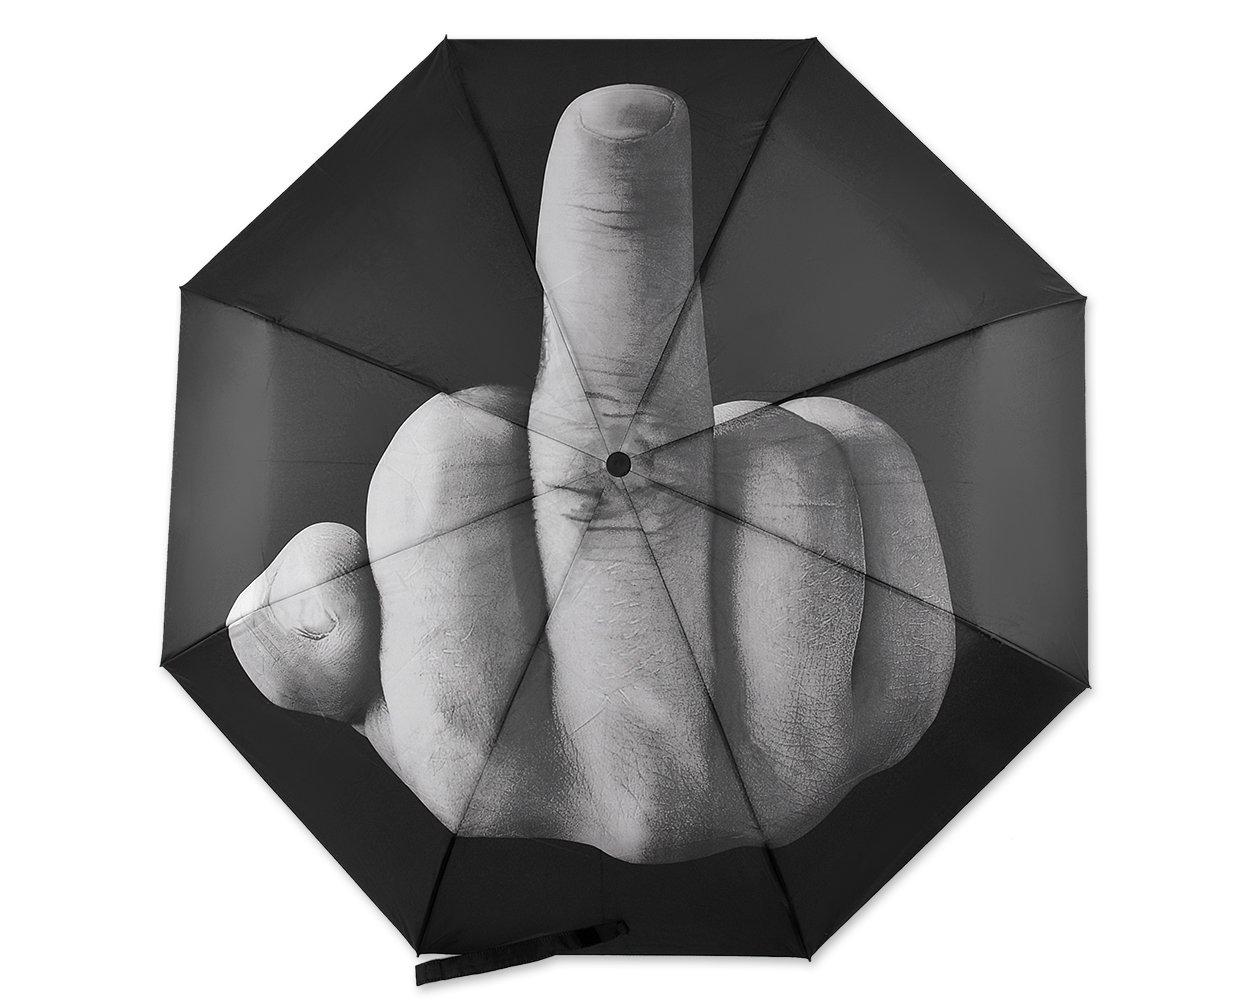 Shopready Middle Finger Umbrella Novelty Umbrella Waterproof Folding Umbrella For Sun Rain Days - Black